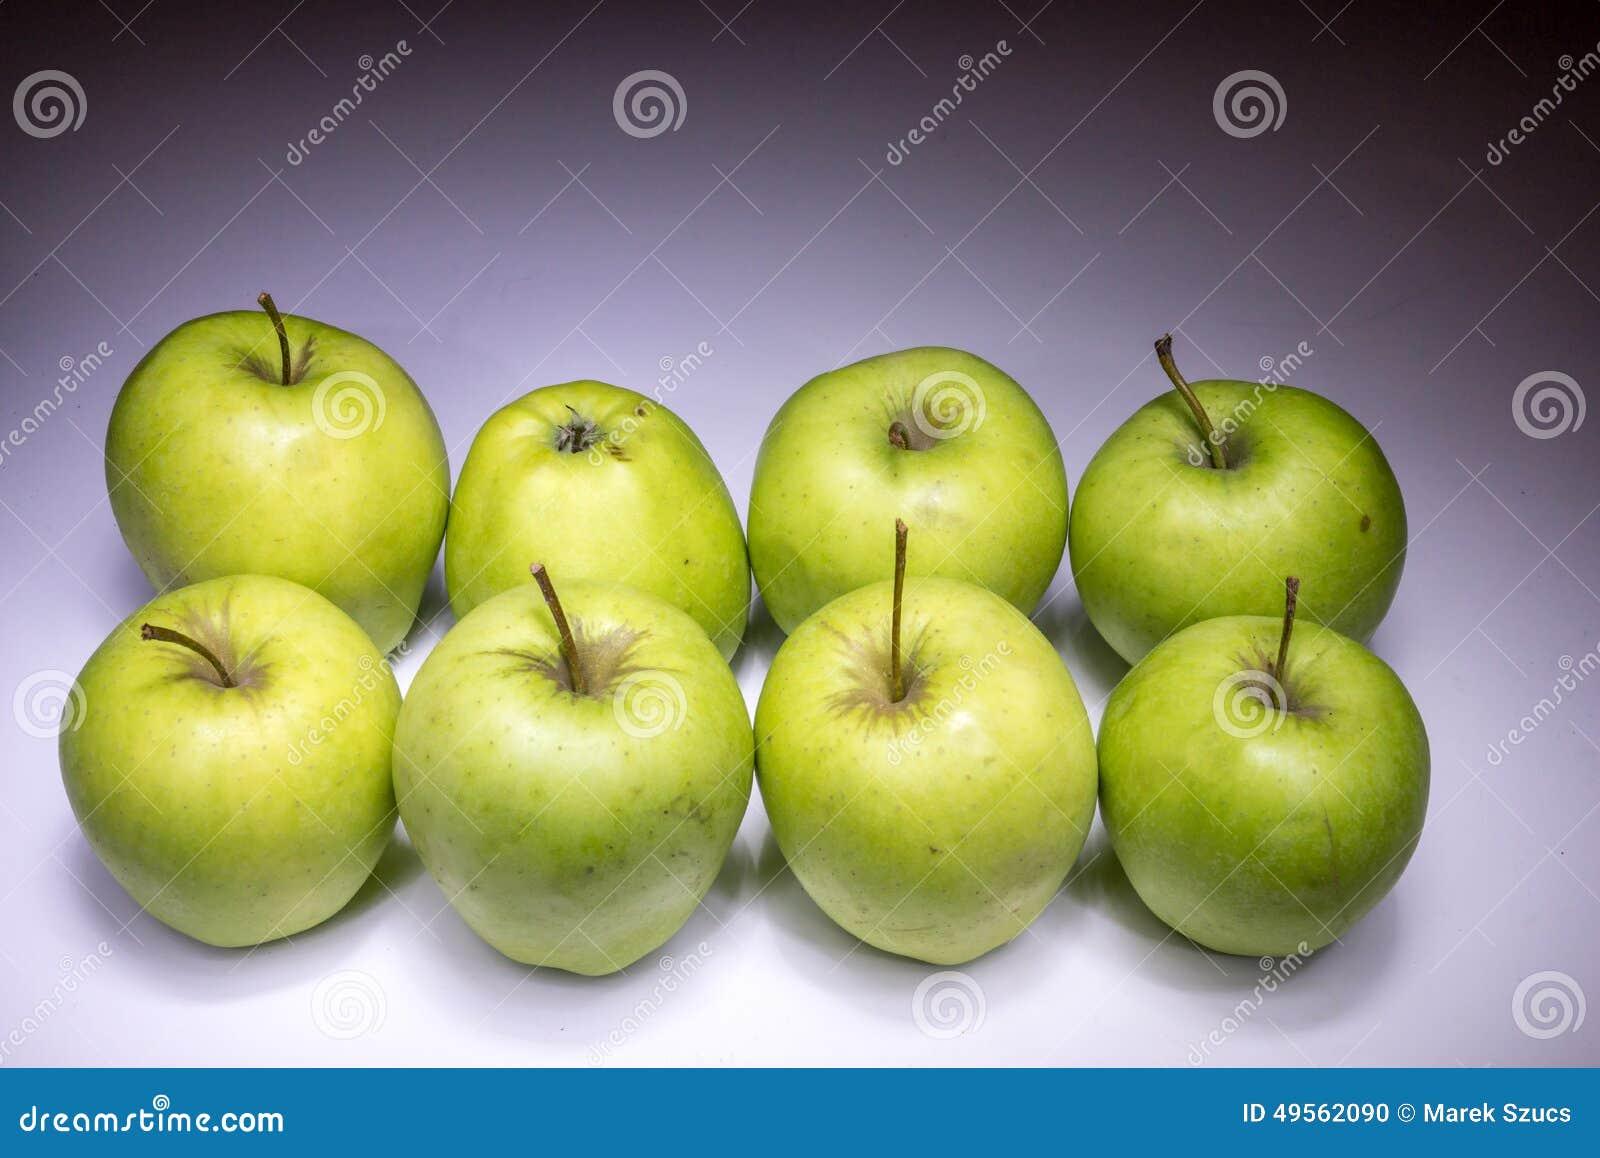 Eight green apples